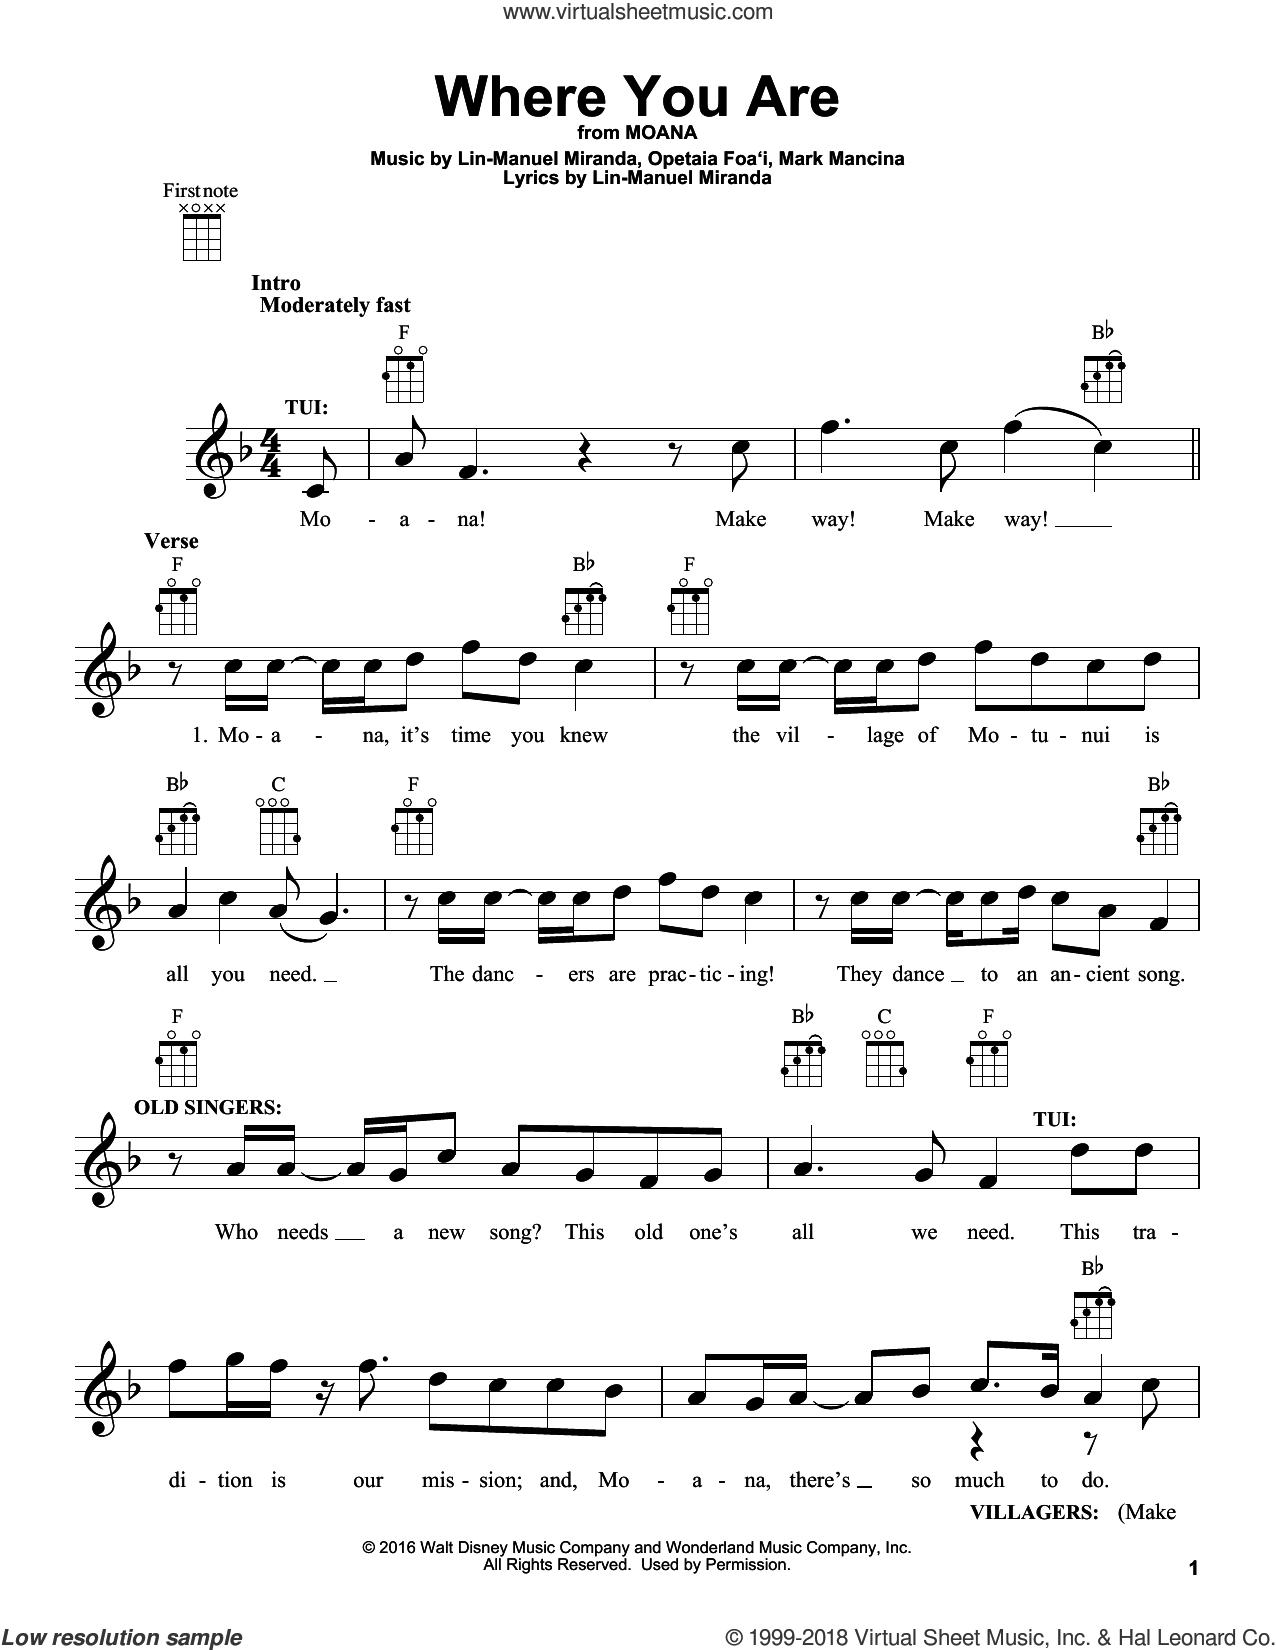 Where You Are (from Moana) sheet music for ukulele by Lin-Manuel Miranda and Mark Mancina, intermediate skill level